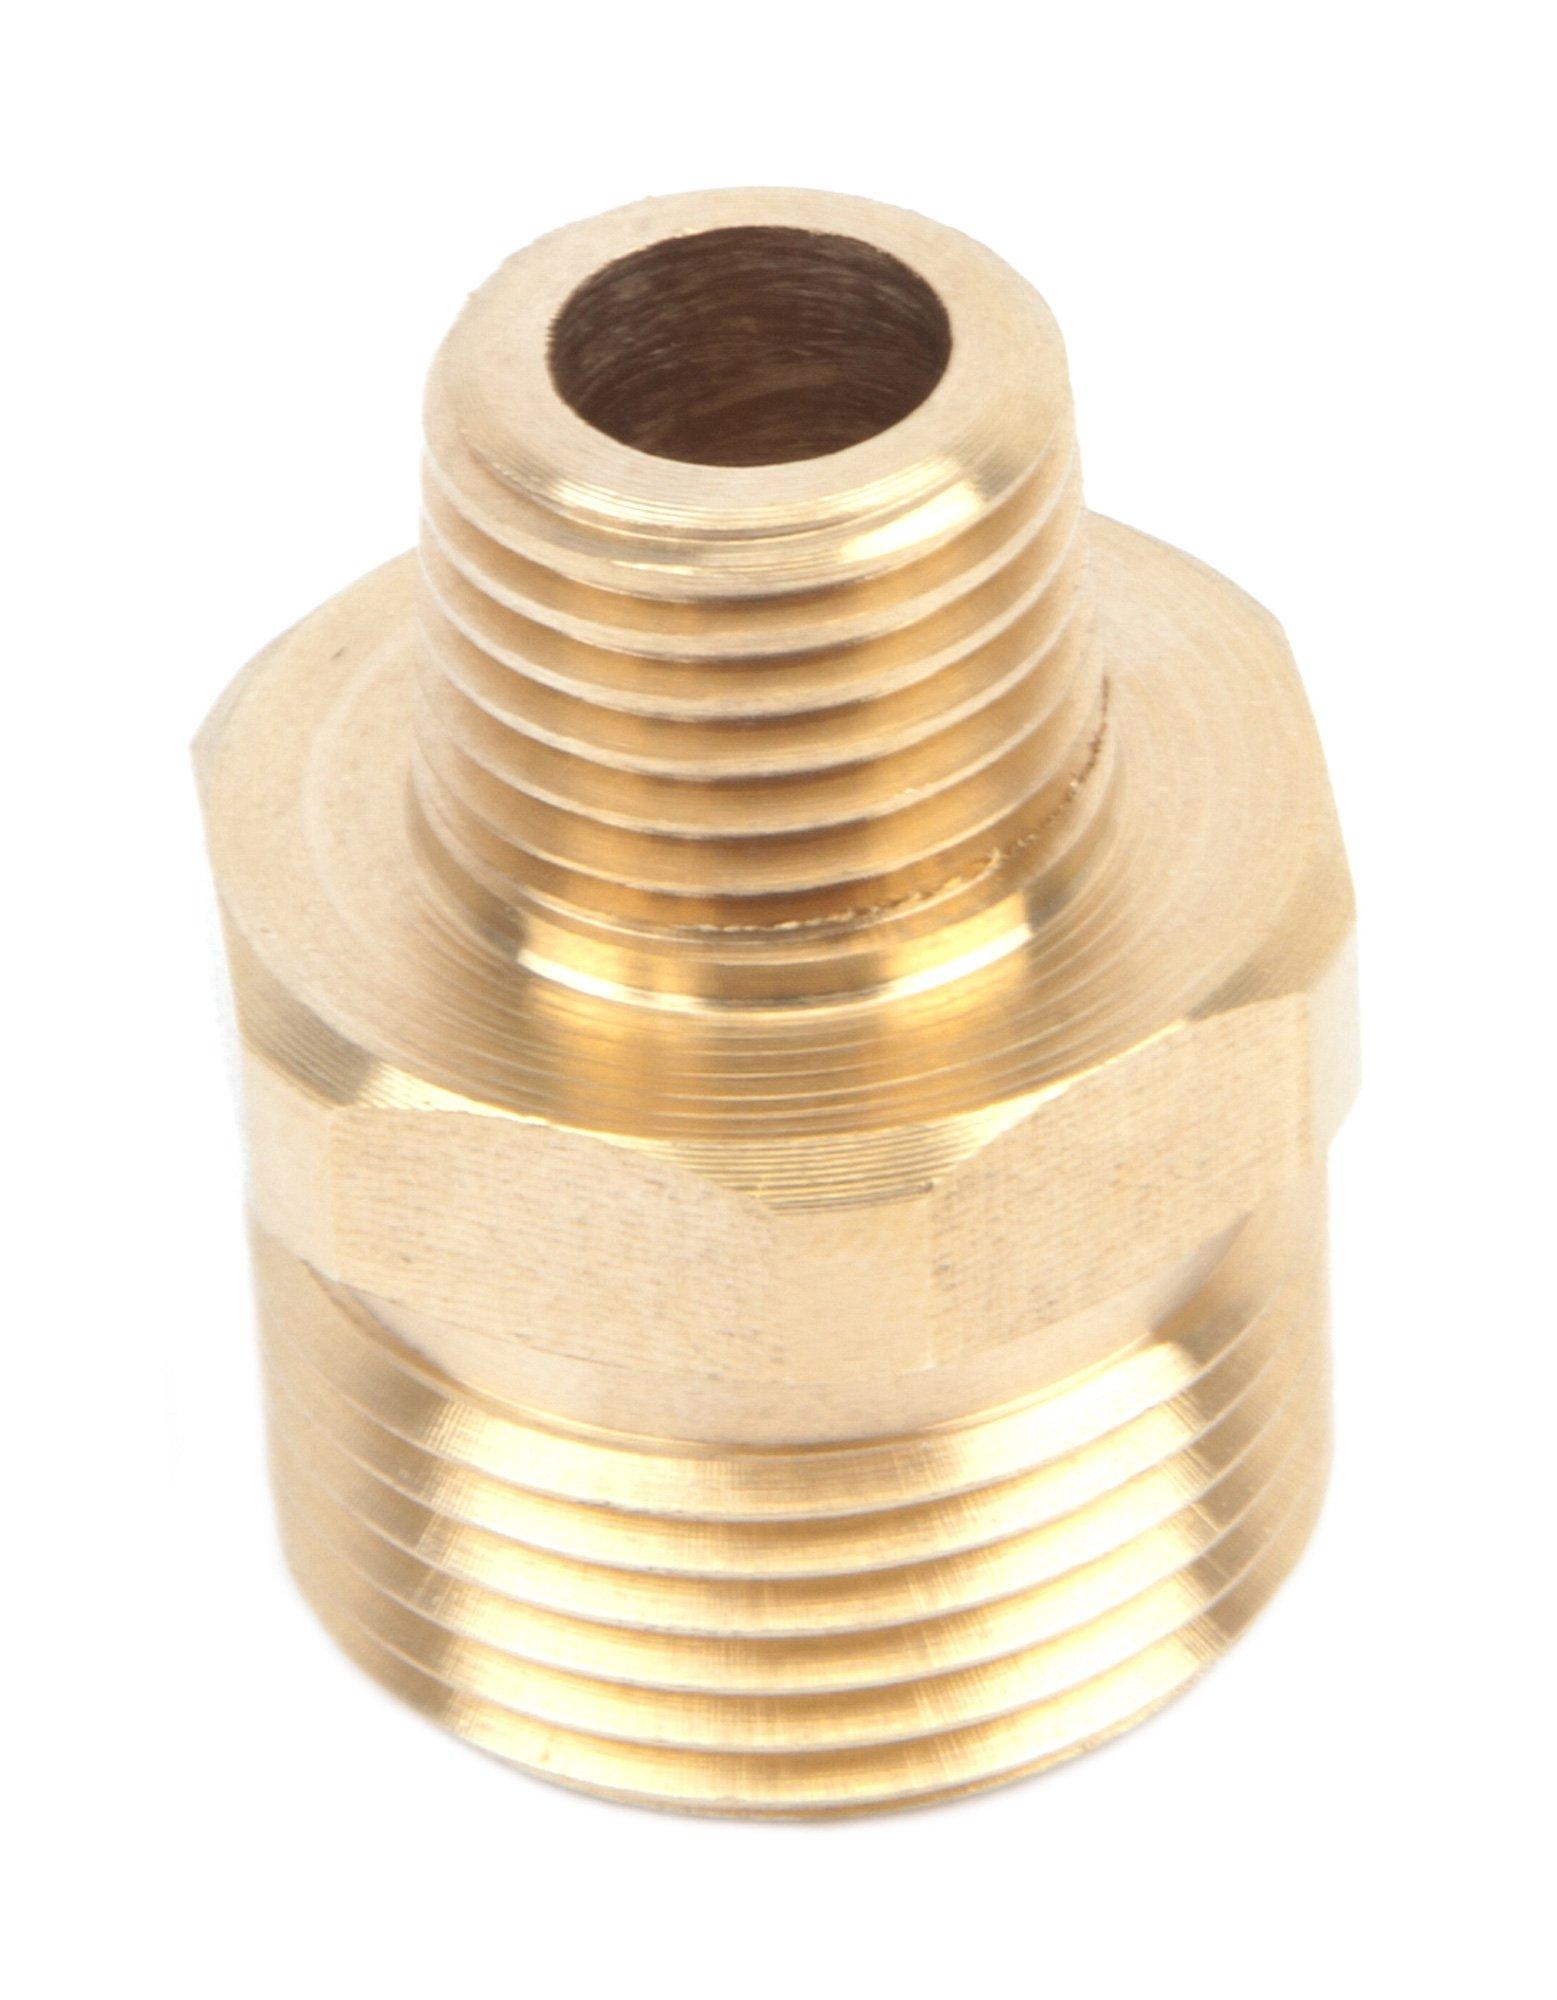 Forney 75115 Pressure Washer Accessories, Male Screw Nipple, M22M to 1/4-Inch Male NPT